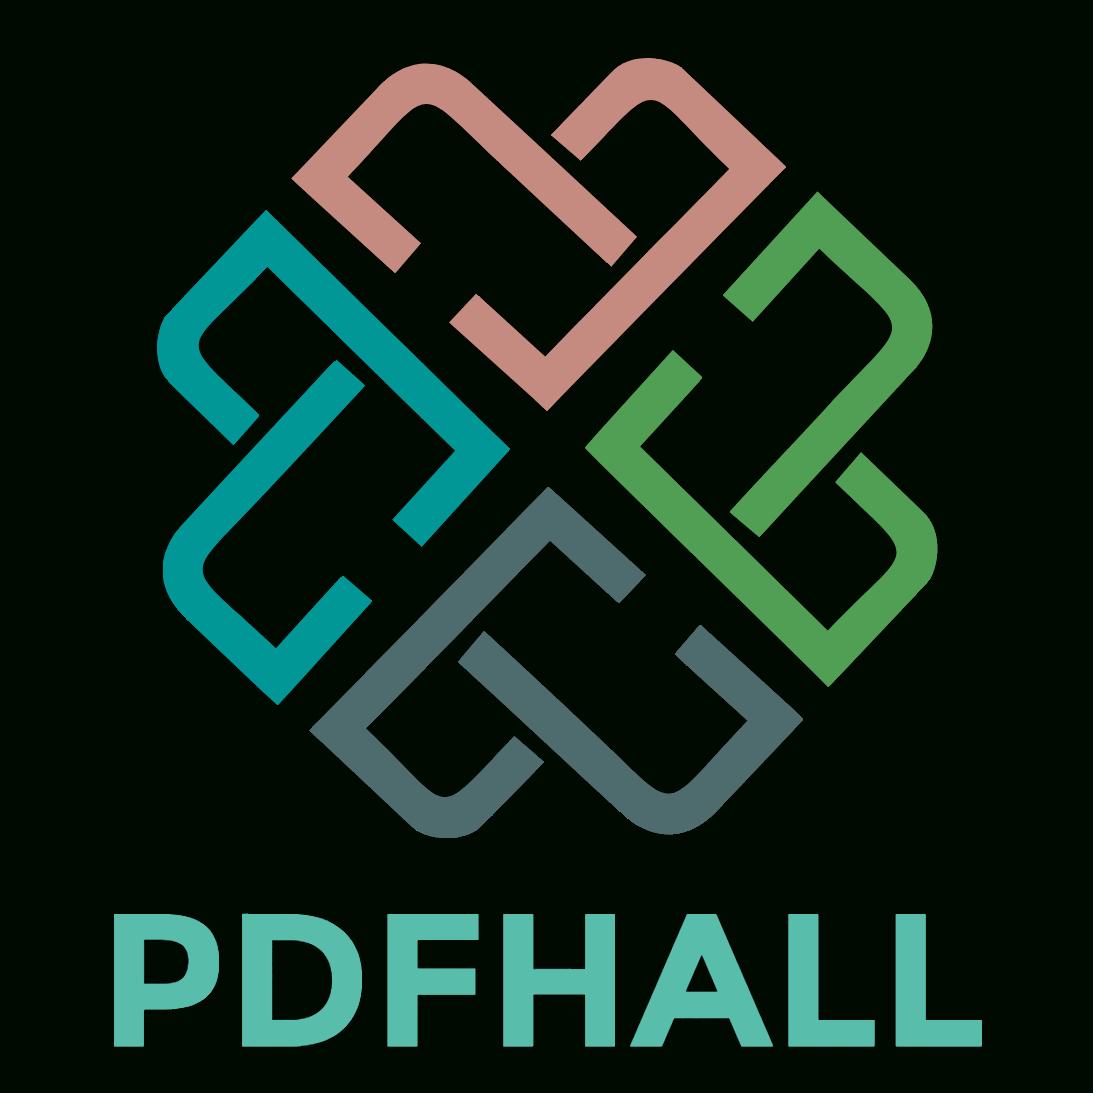 Liste Des Ports - Pdfhall